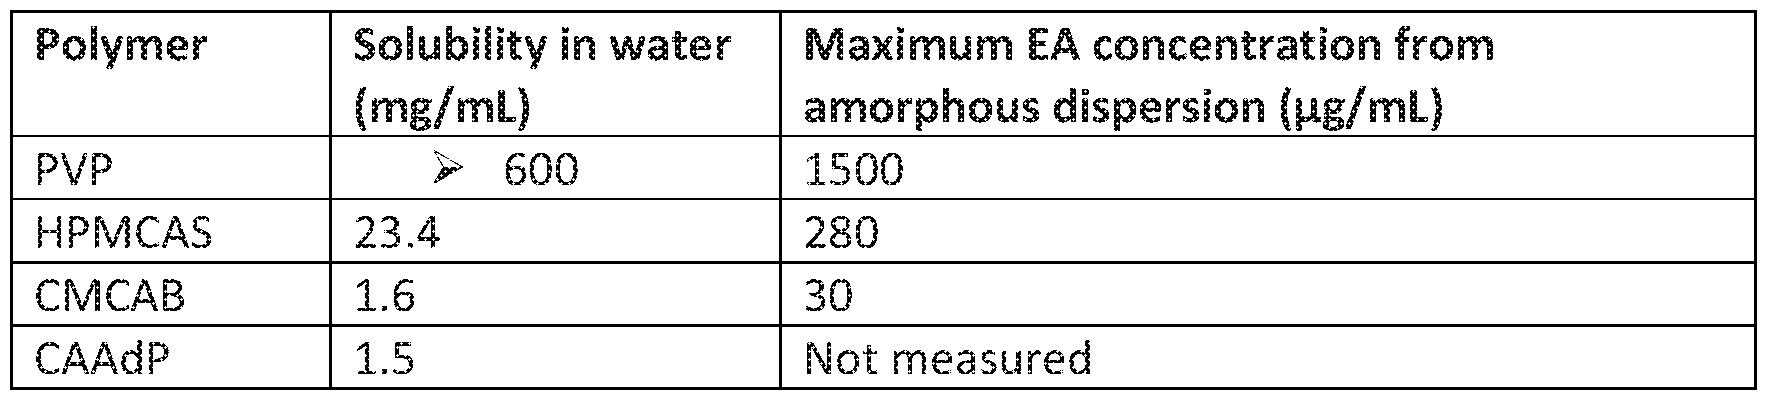 diflucan caps 150 mg цена